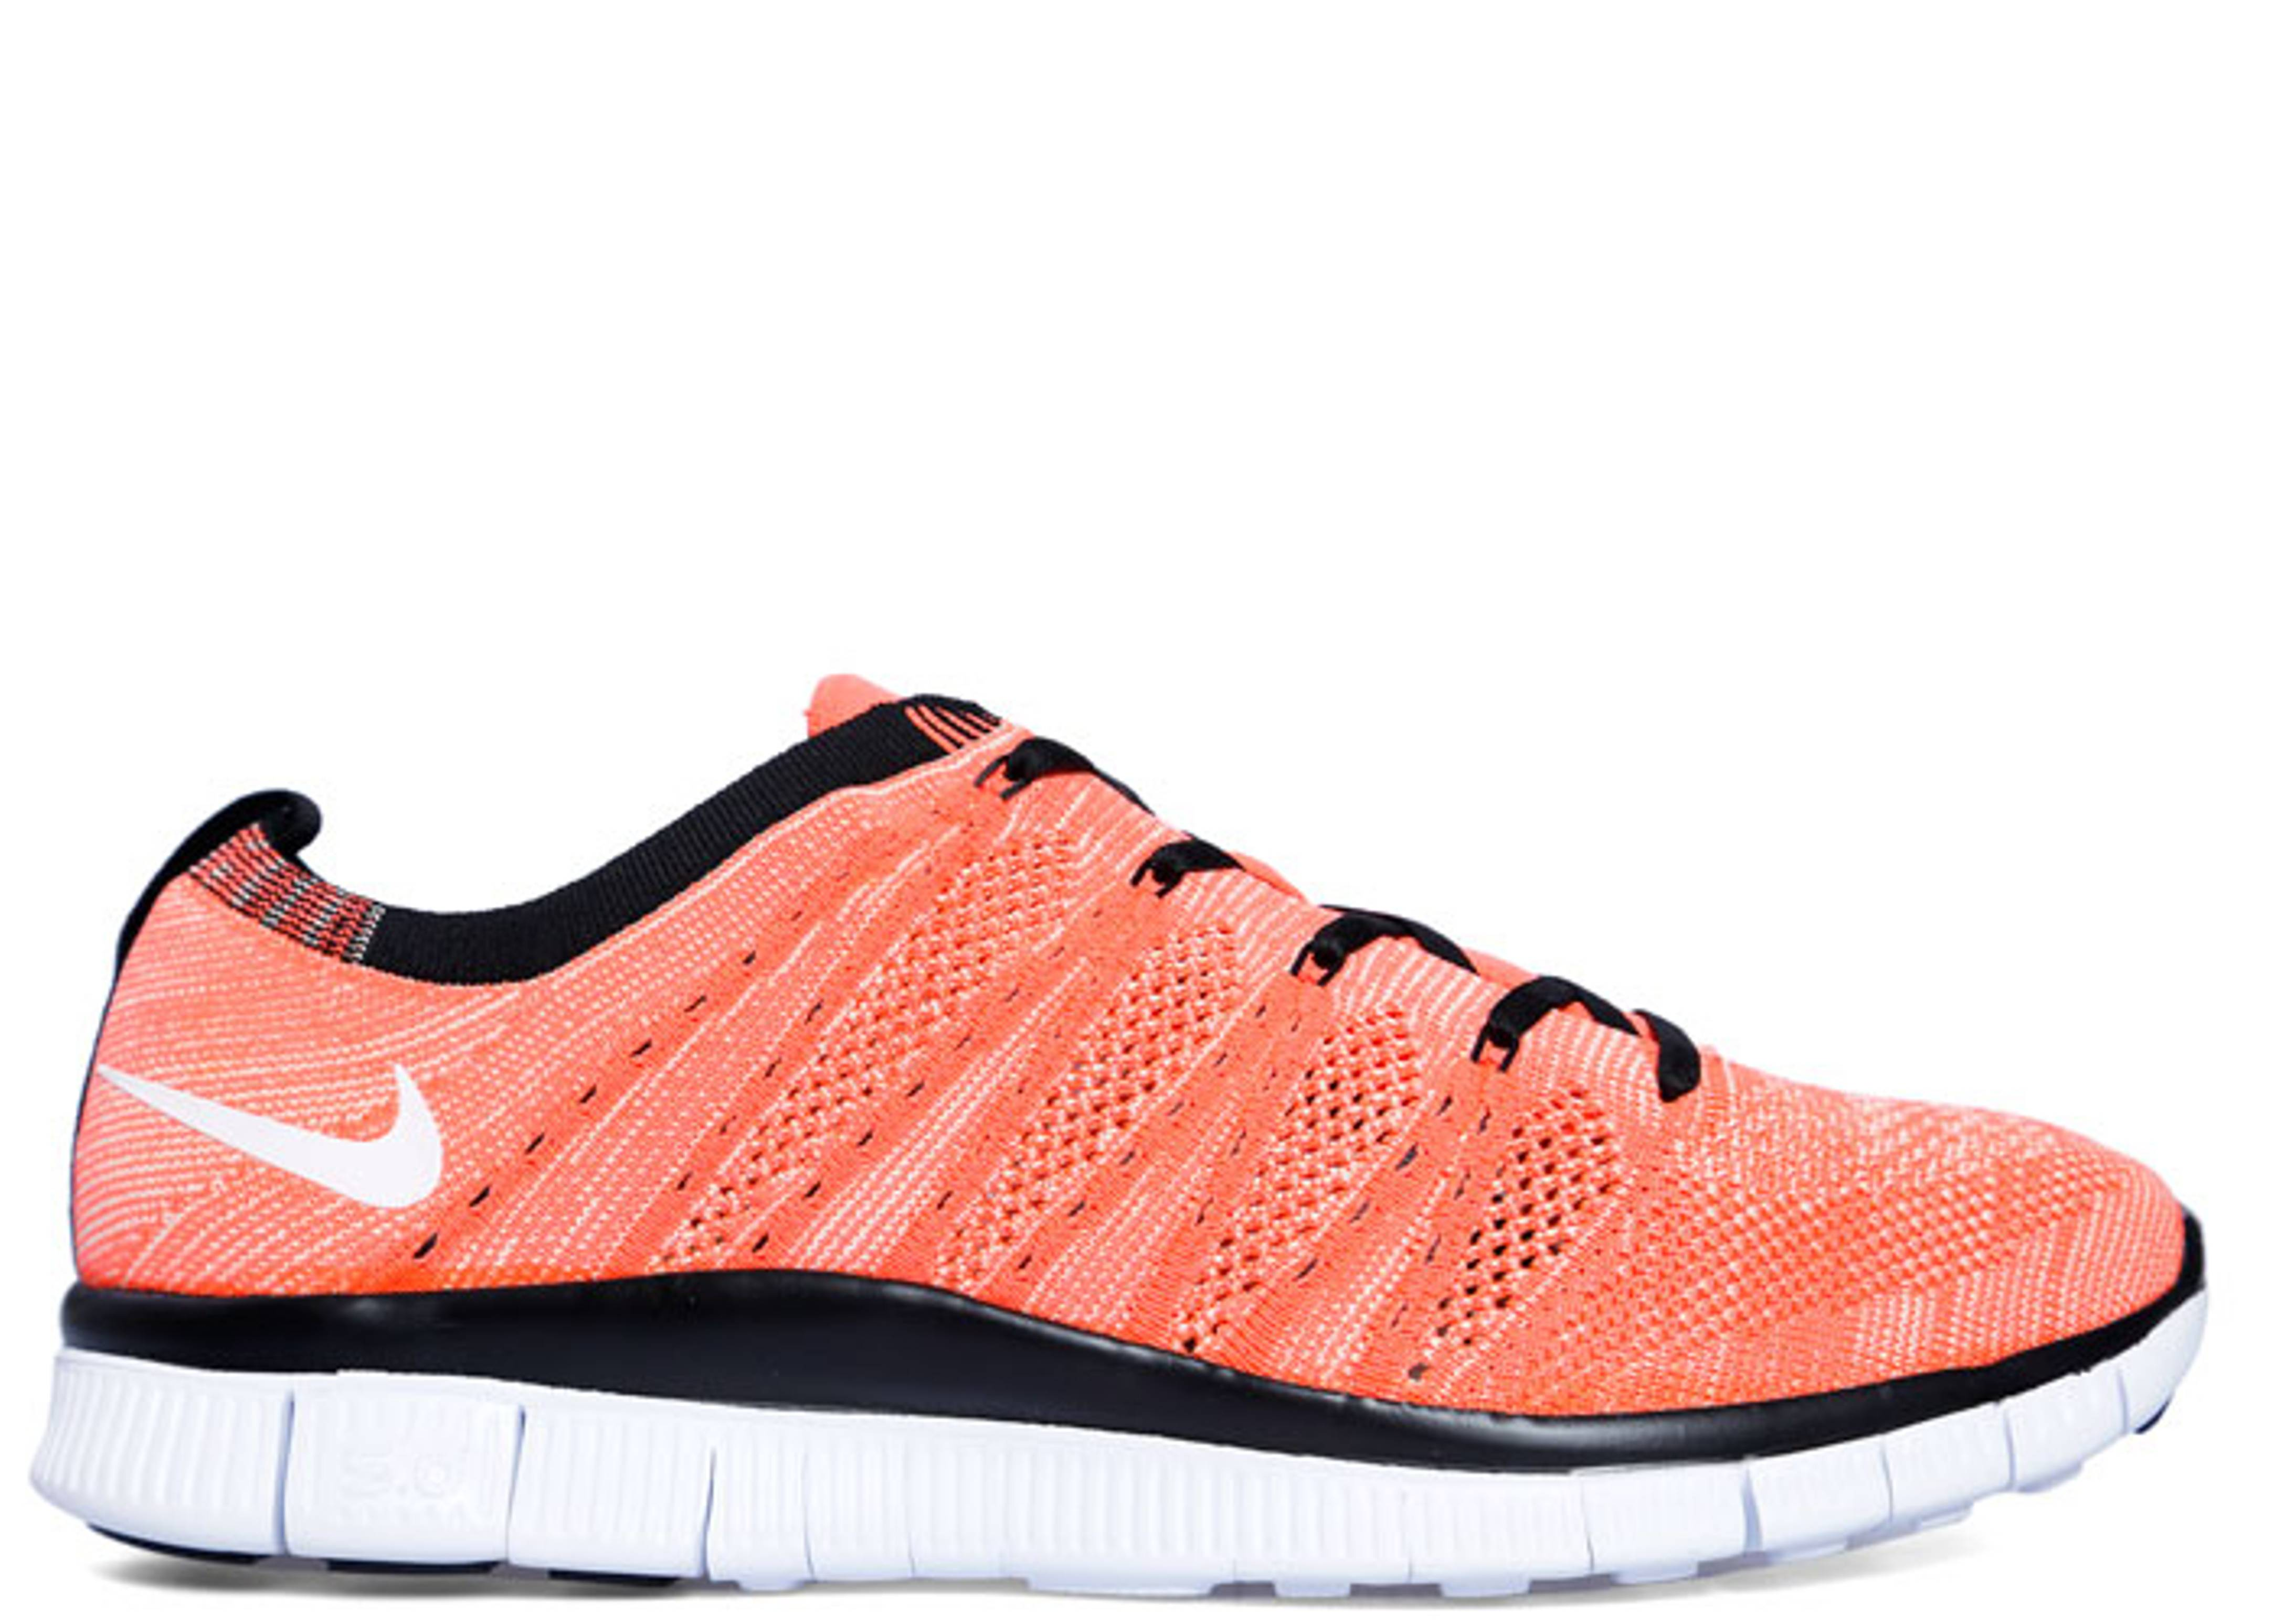 0bfc0ea215a2 Free Flyknit Nsw - Nike - 599459 800 - hot lava white-vapor green ...